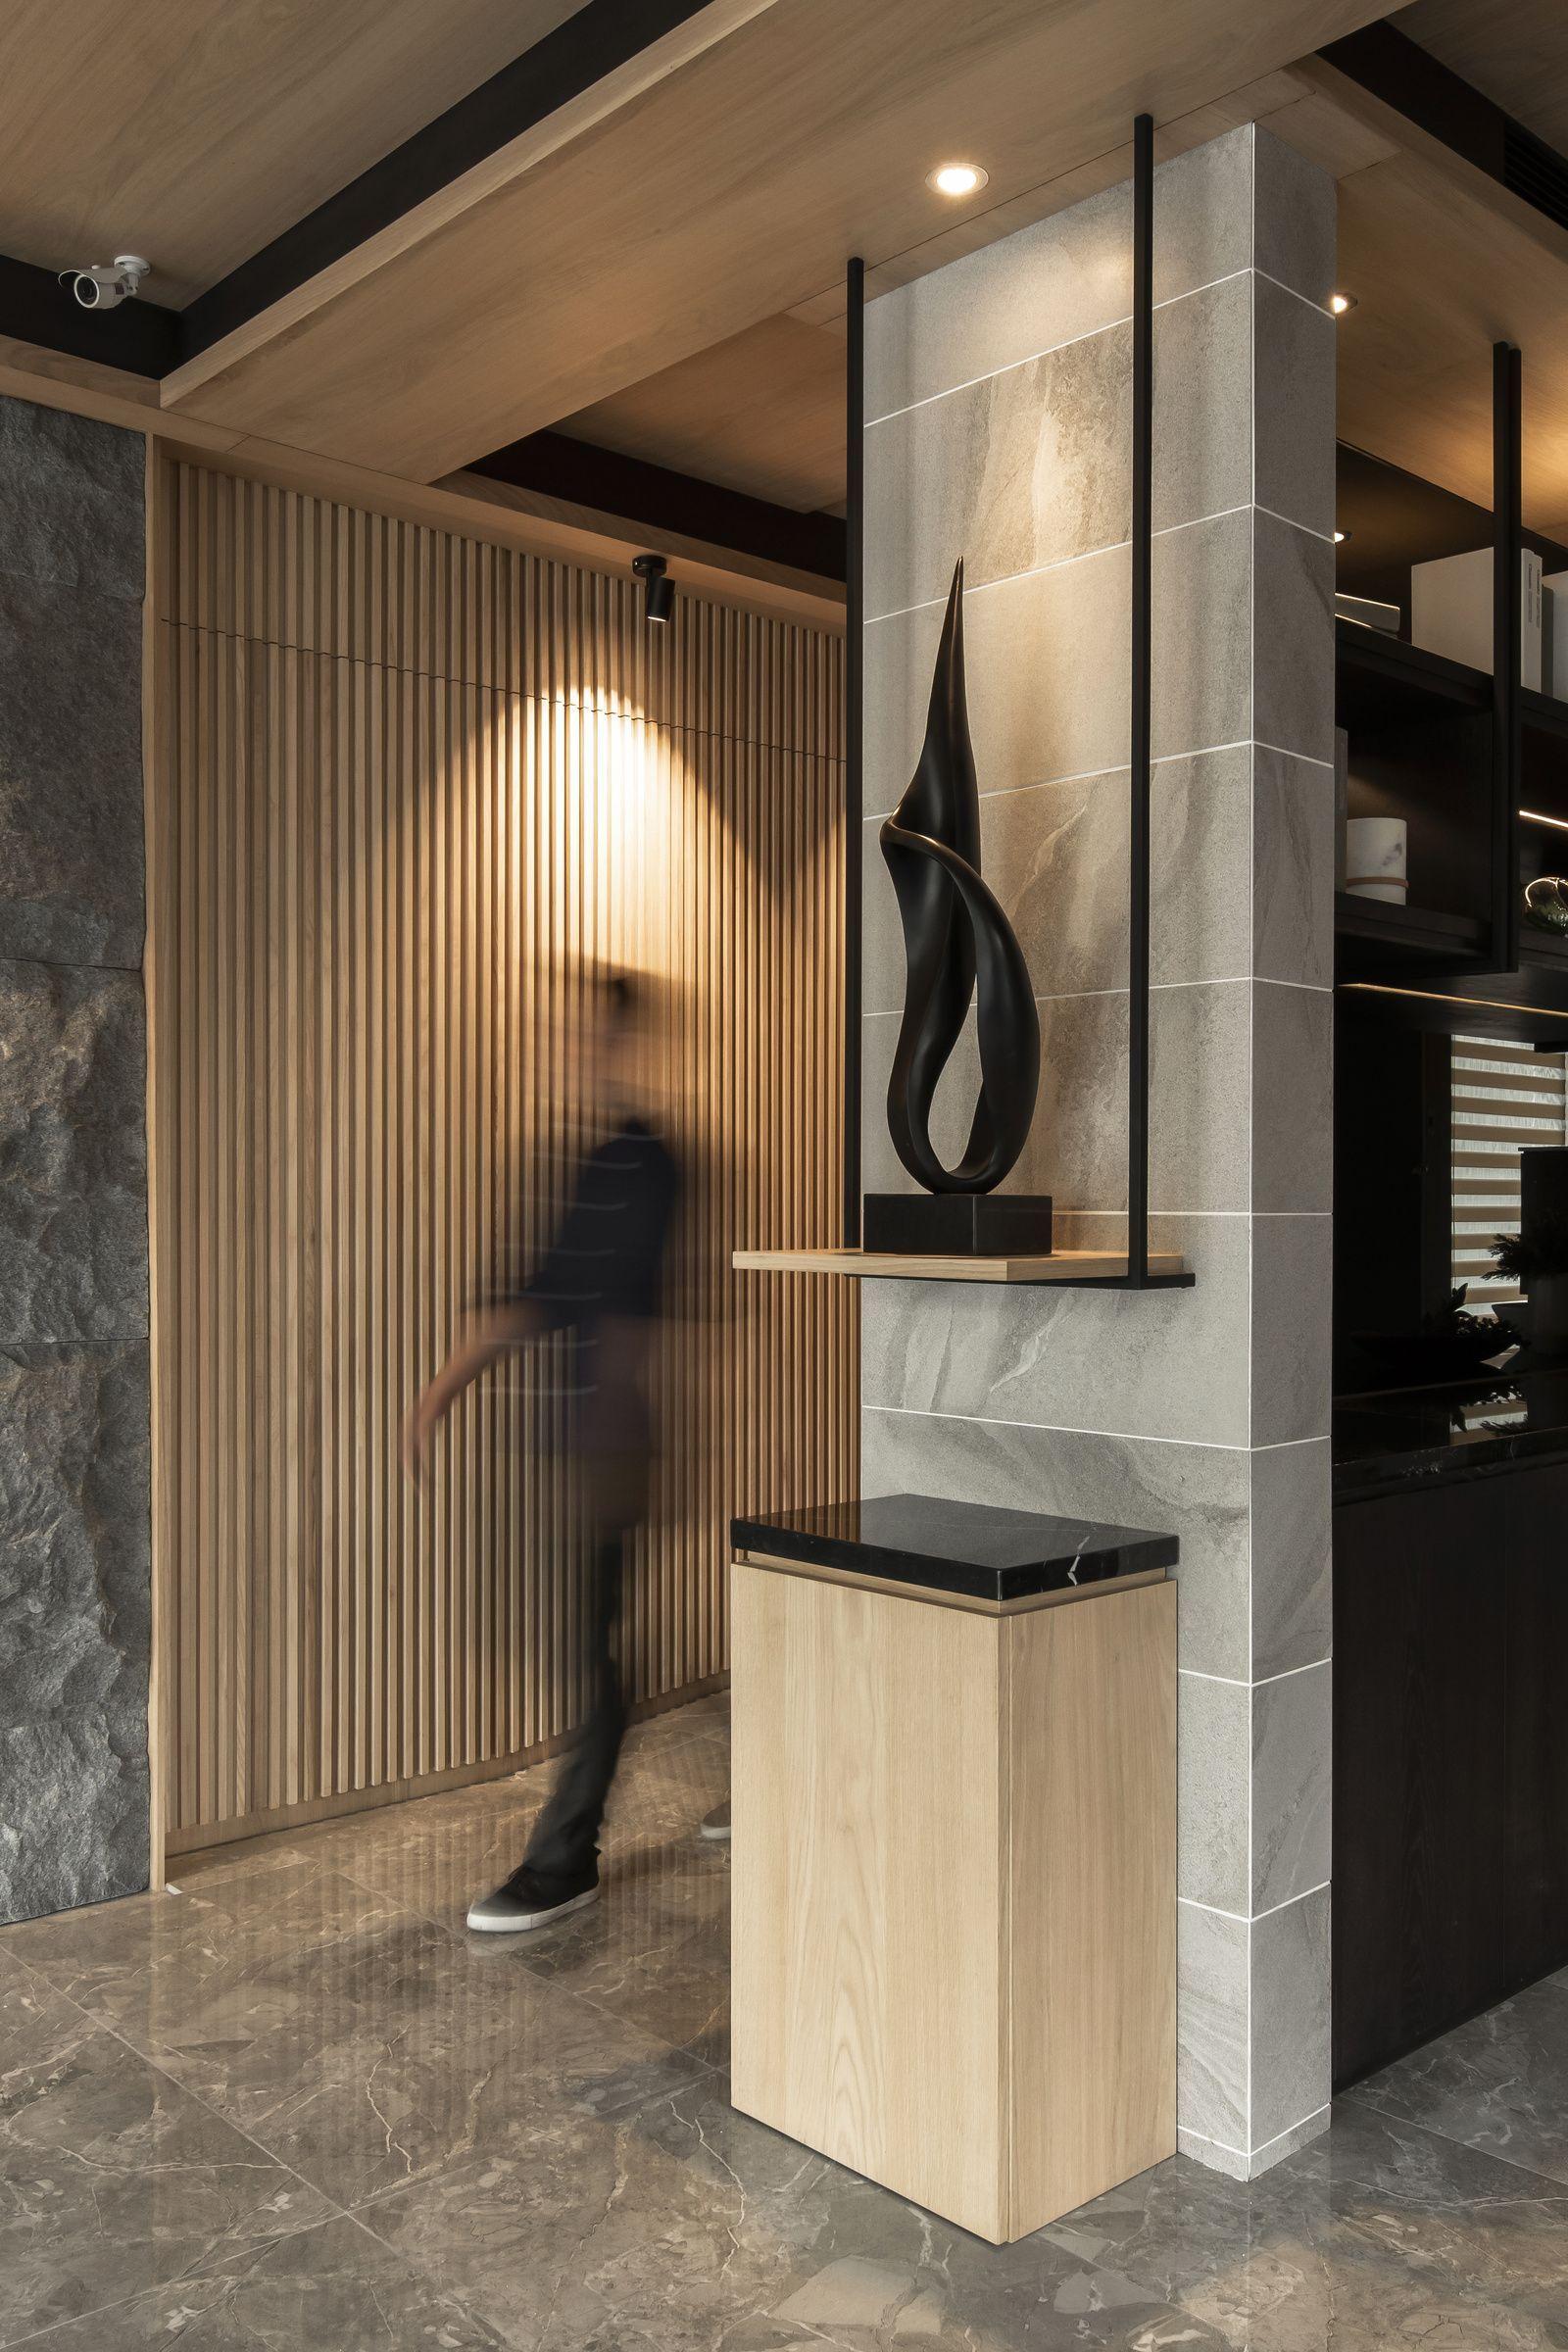 Best Design Trends Of 2019 Fluid Shapes With Images Design Column Design Interior Architecture